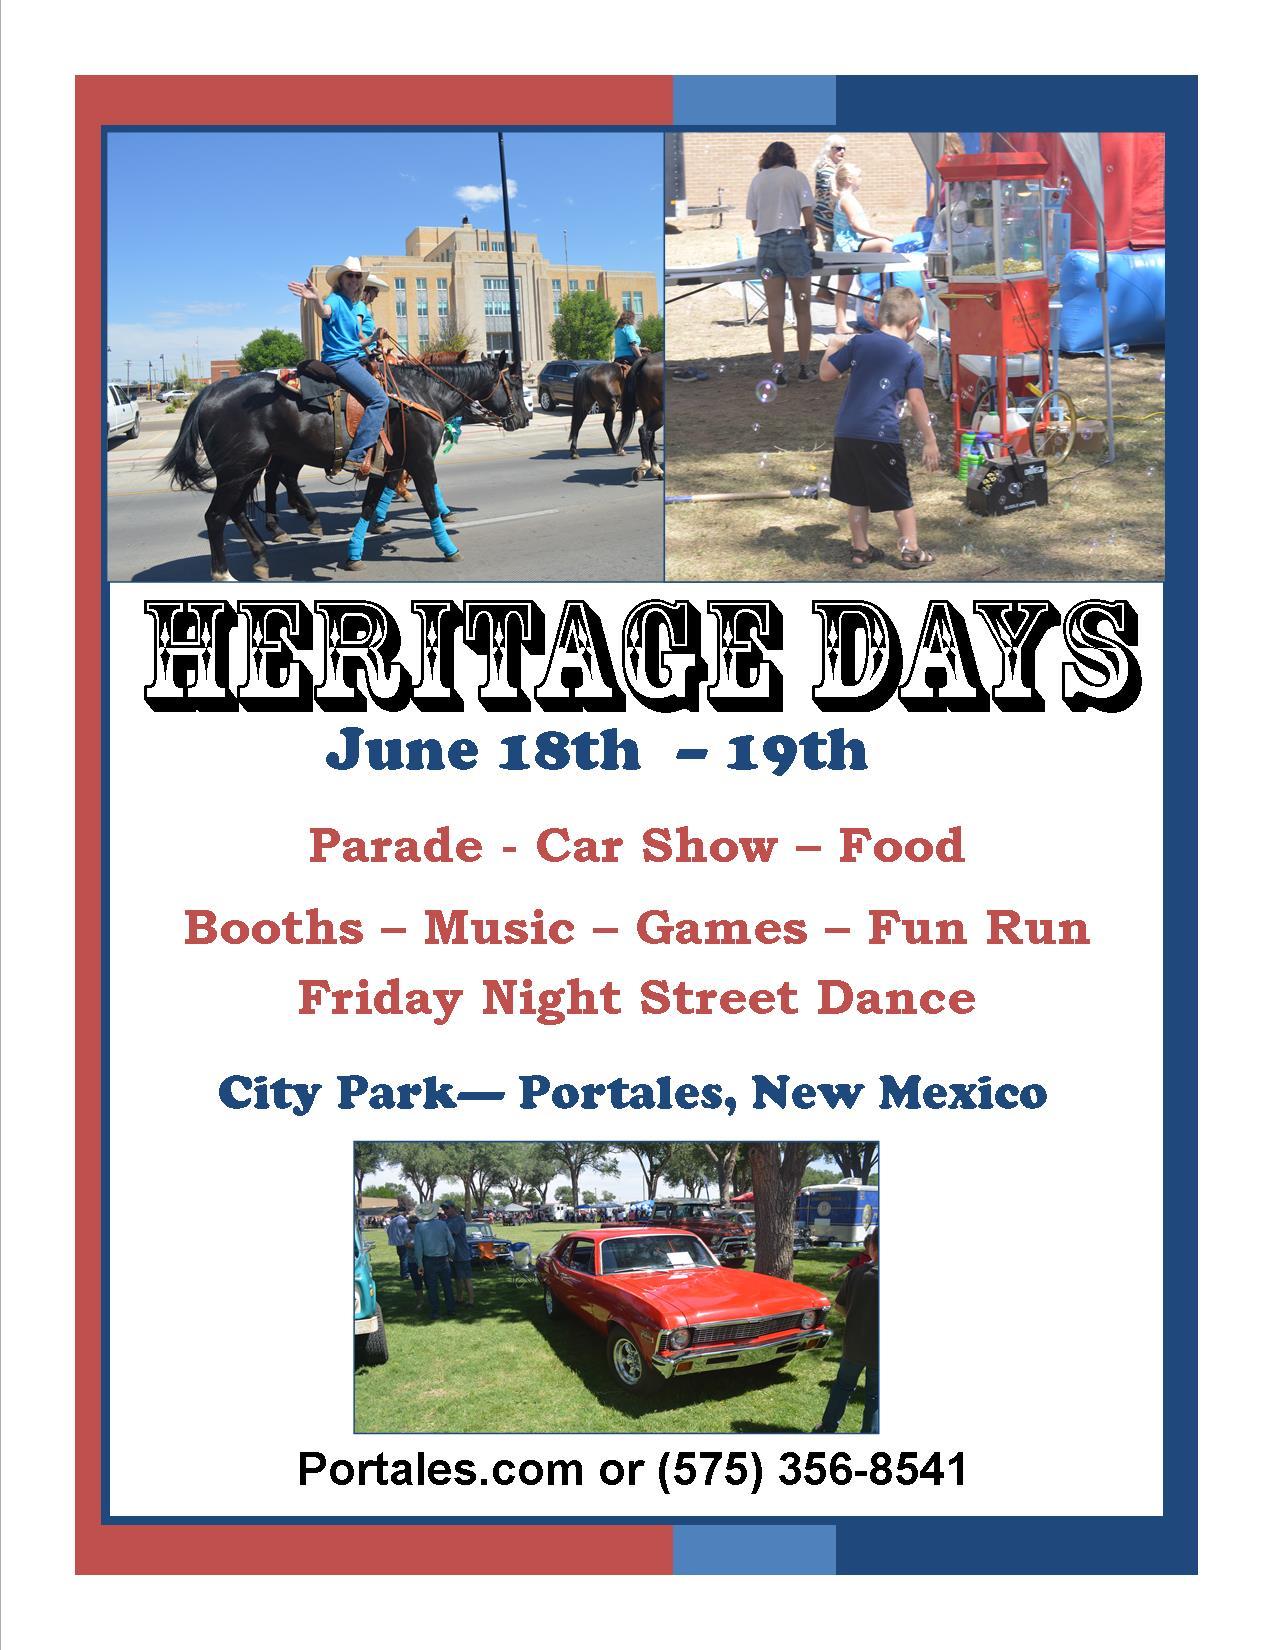 Heritage-Days.jpg